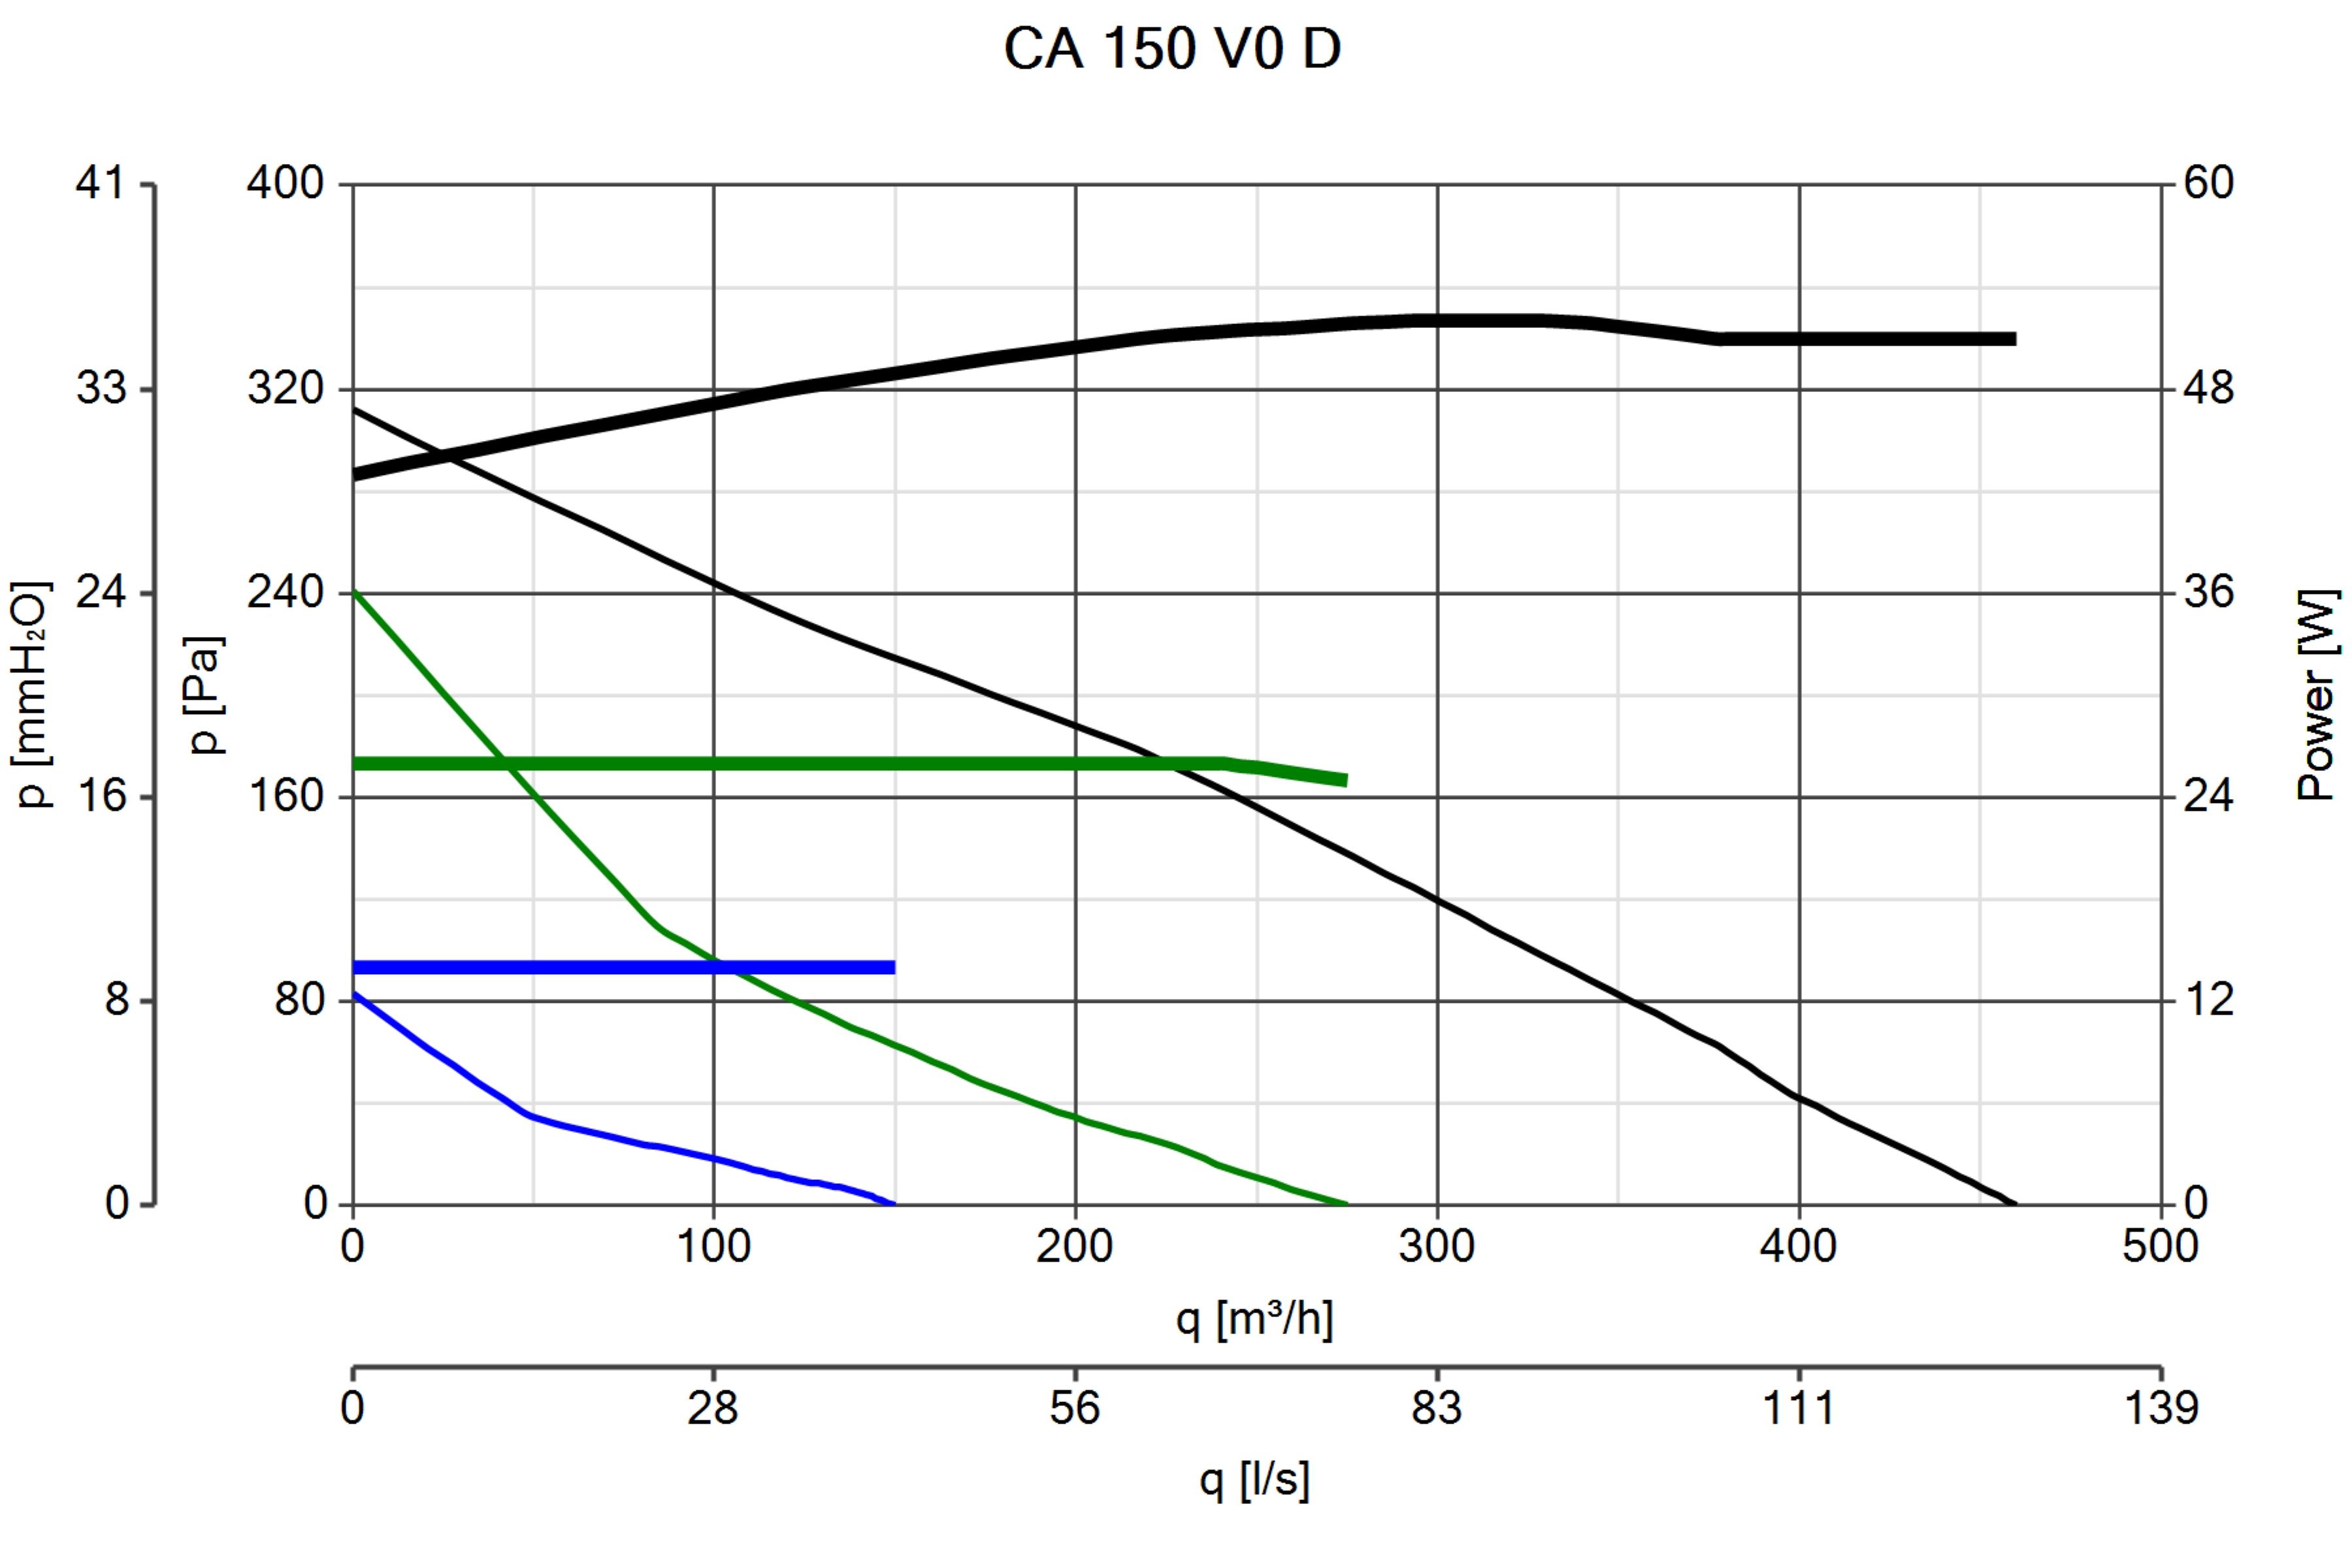 Ca 150 V0 D Commercial Ventilation Centrifugal Fans Vortice Fan Wiring Diagram 30 60